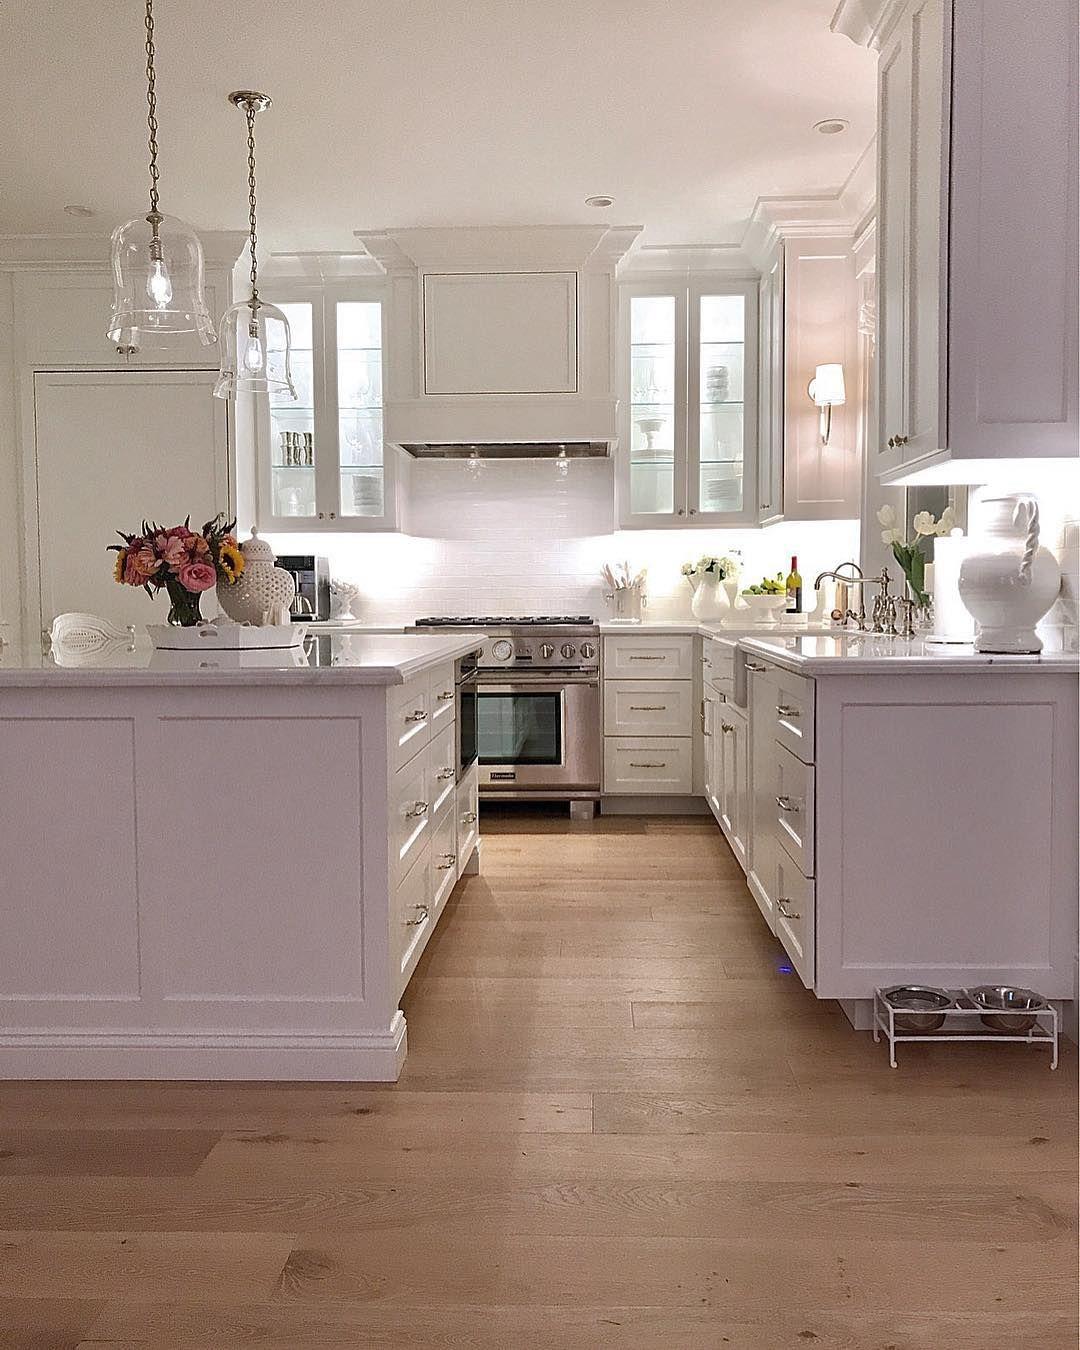 Bright White Kitchen Design Photokristy Wicks Kristywicks Best What Is New In Kitchen Design Inspiration